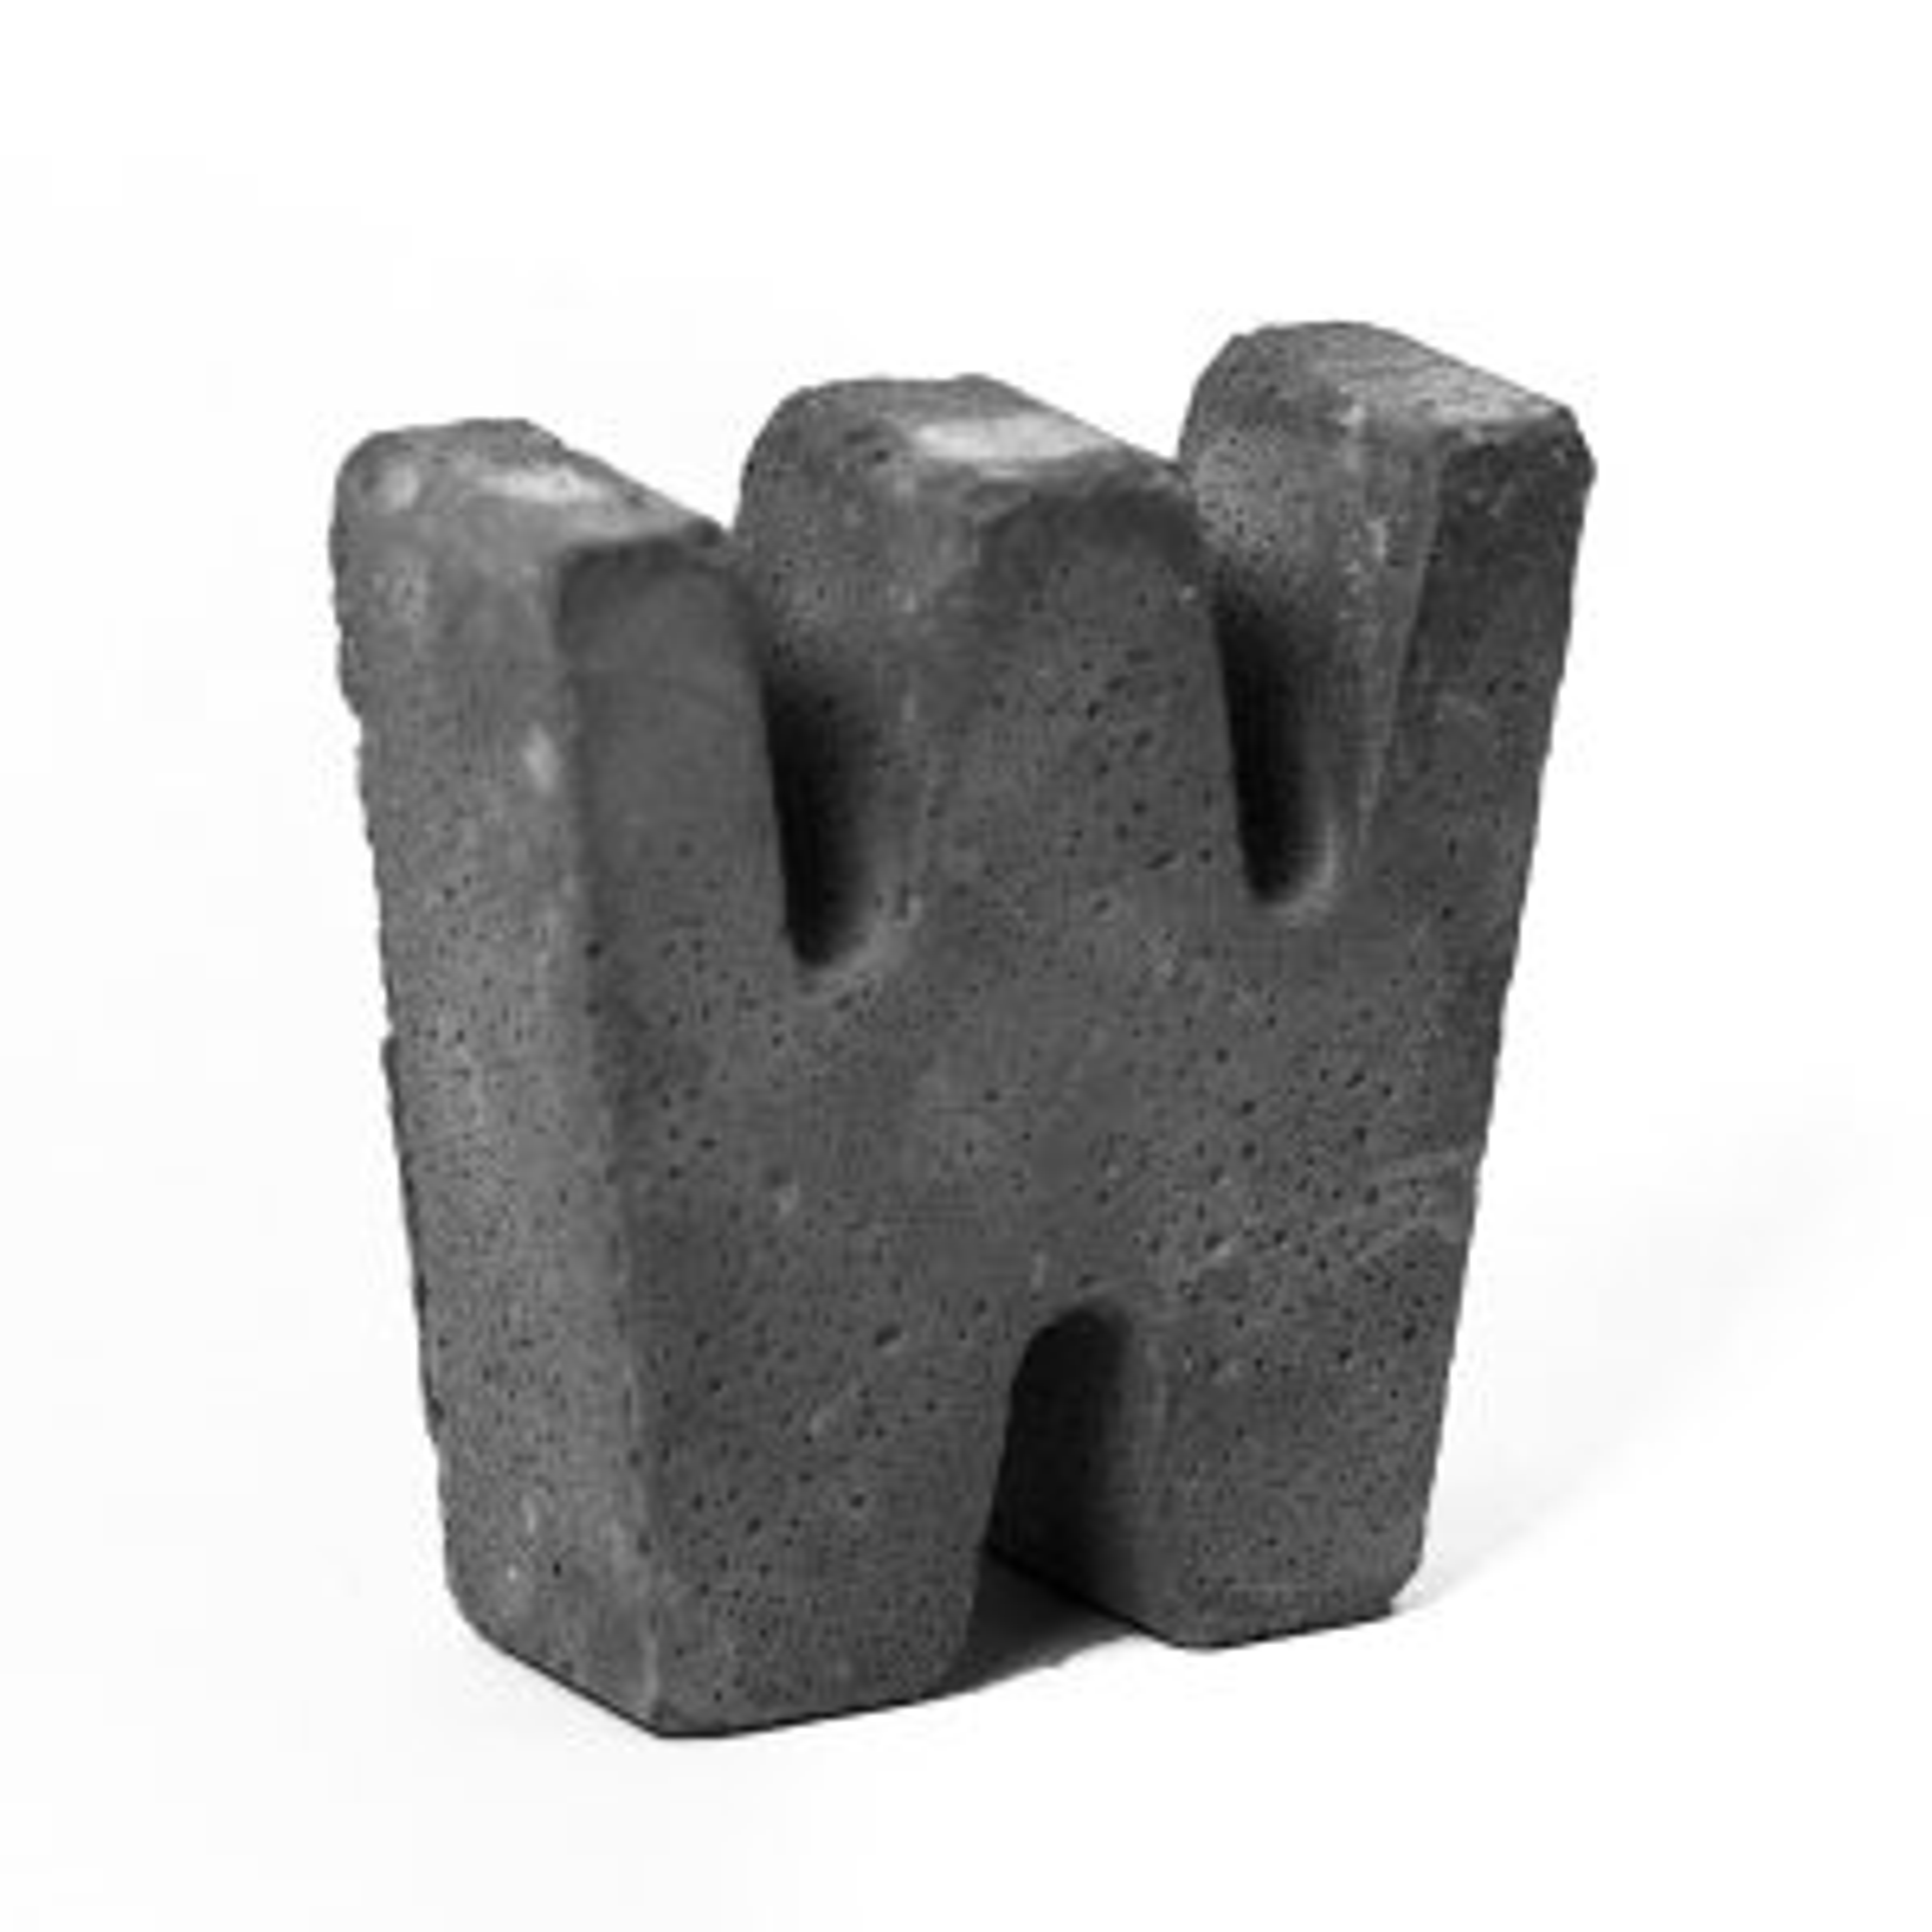 مجسمه بتنی طرح حروف مدل letter W